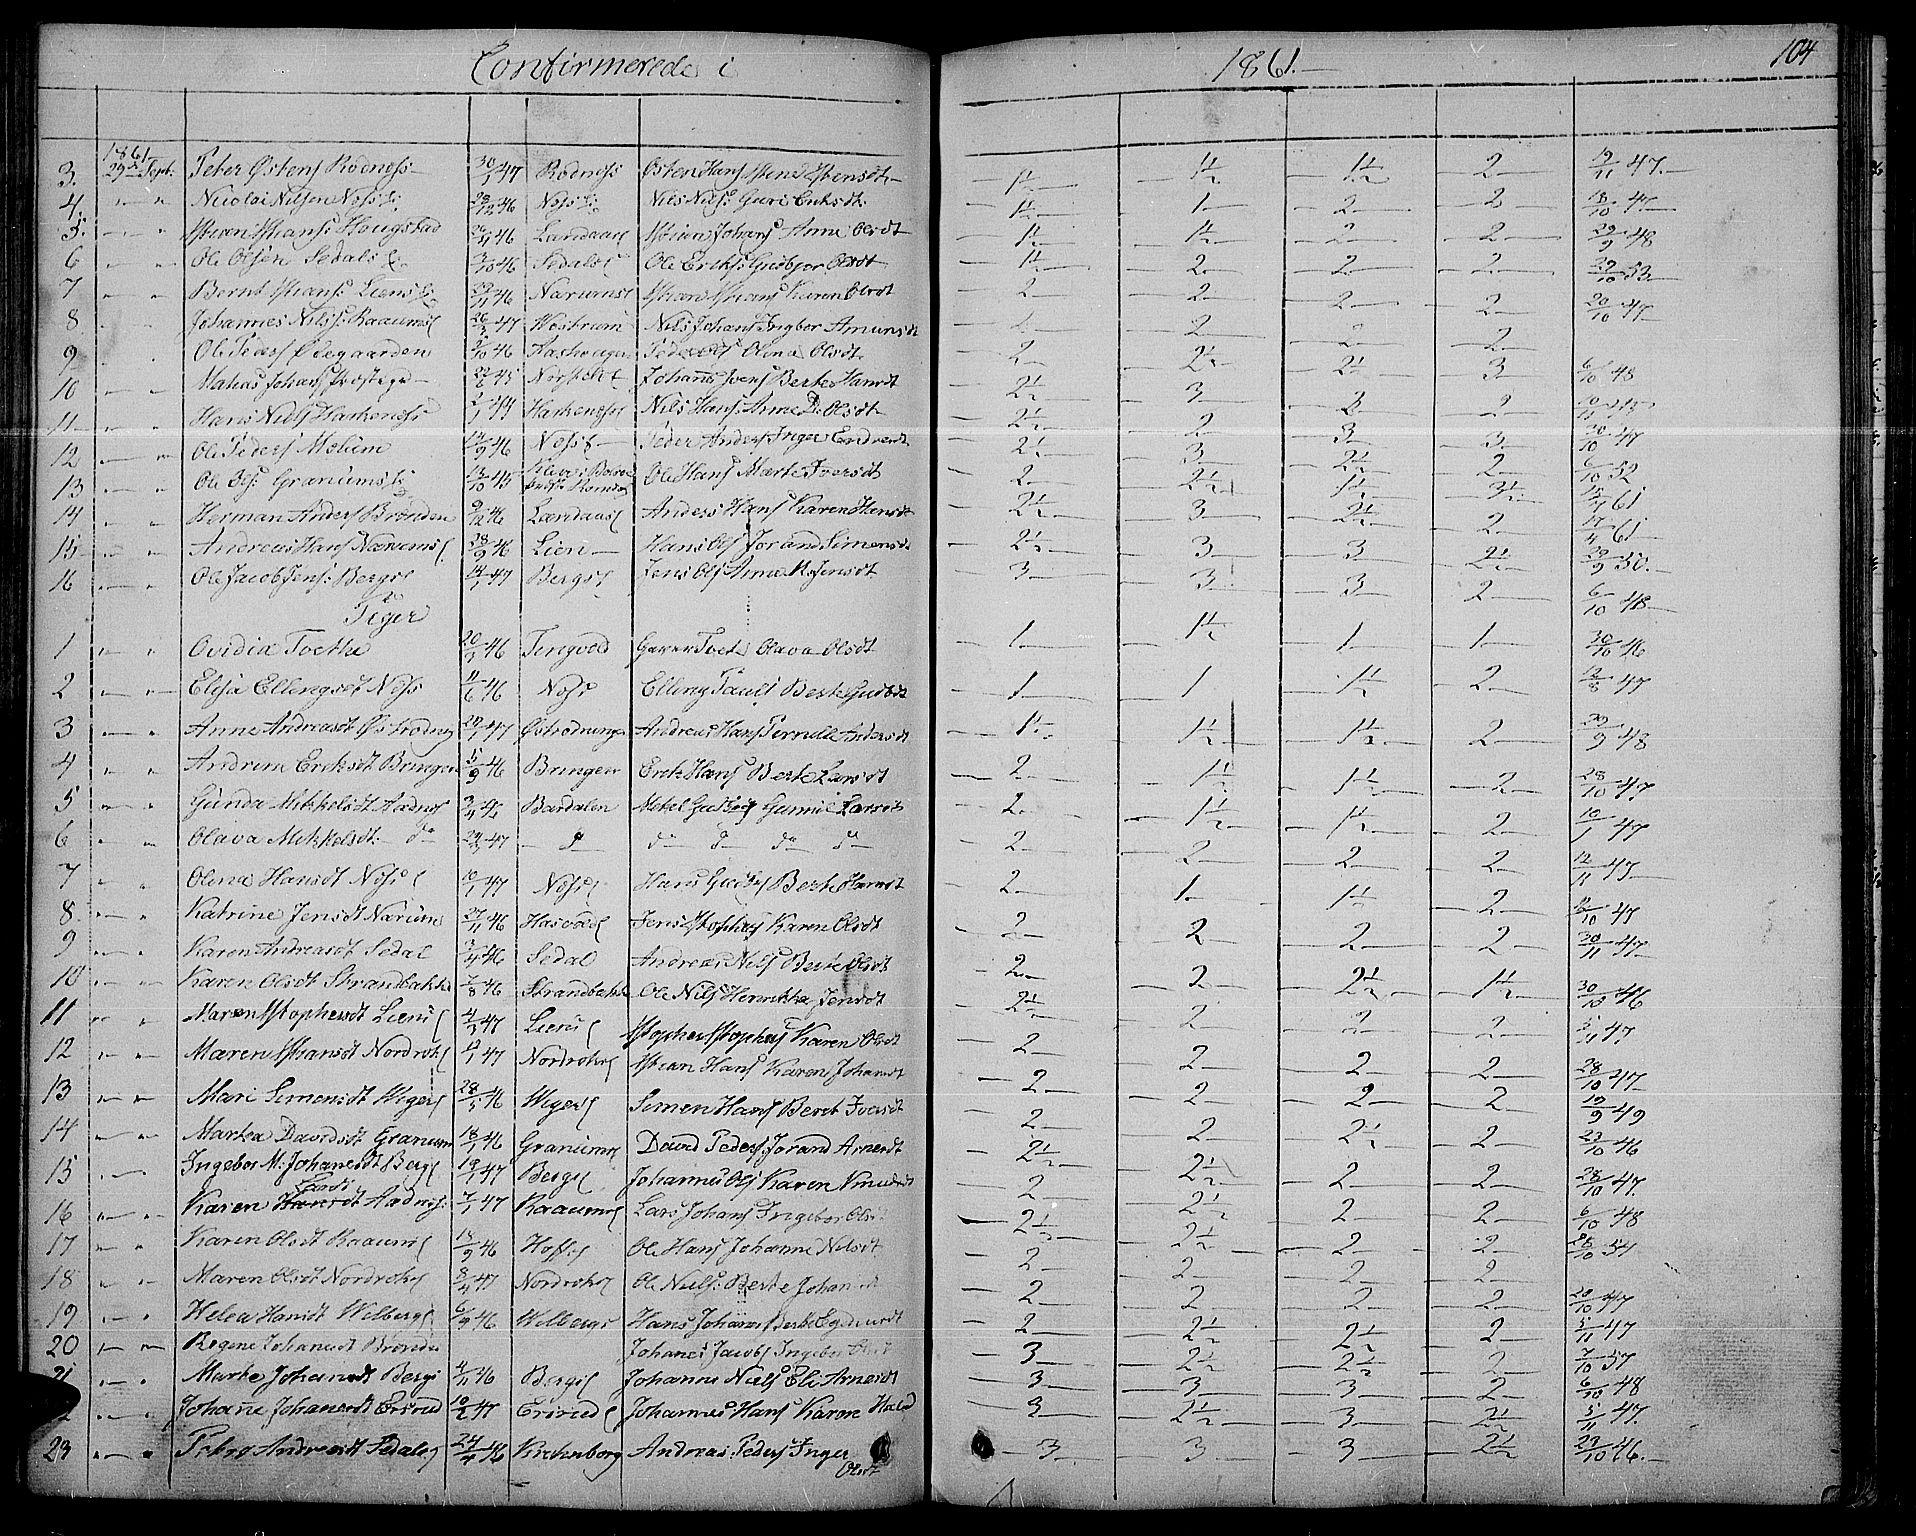 SAH, Søndre Land prestekontor, L/L0001: Klokkerbok nr. 1, 1849-1883, s. 104